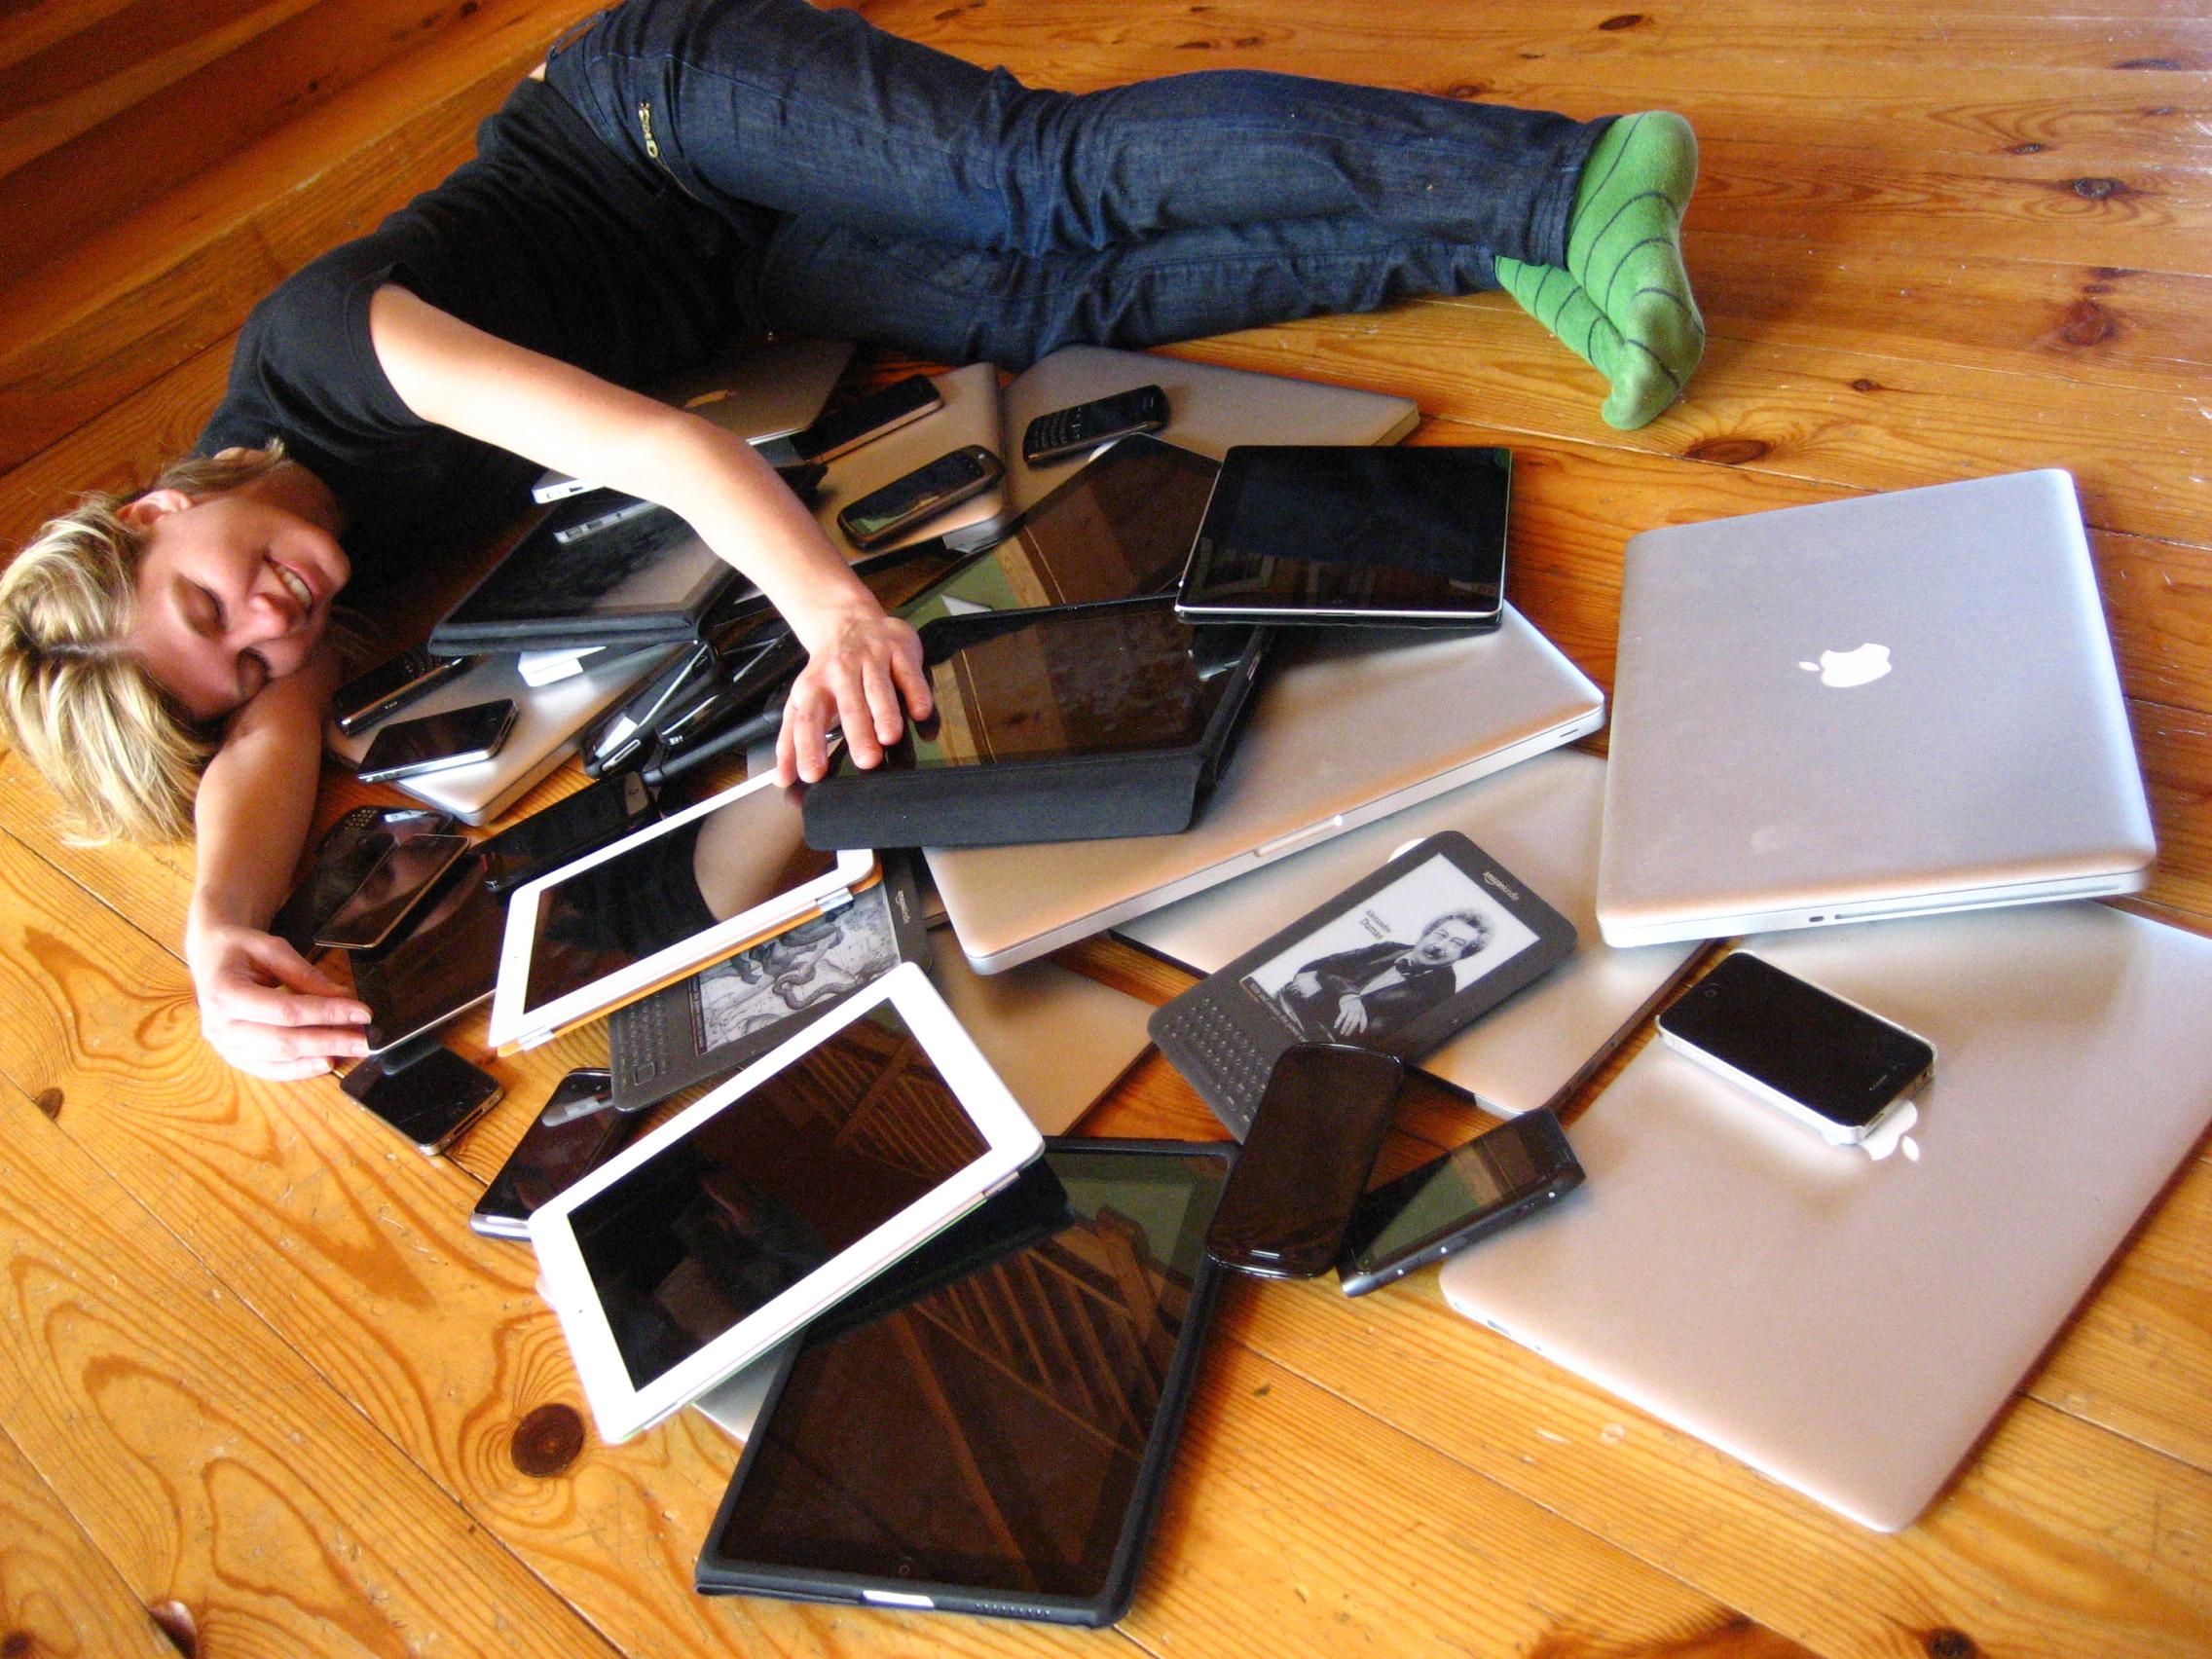 English: A woman cuddling a pile of digital de...